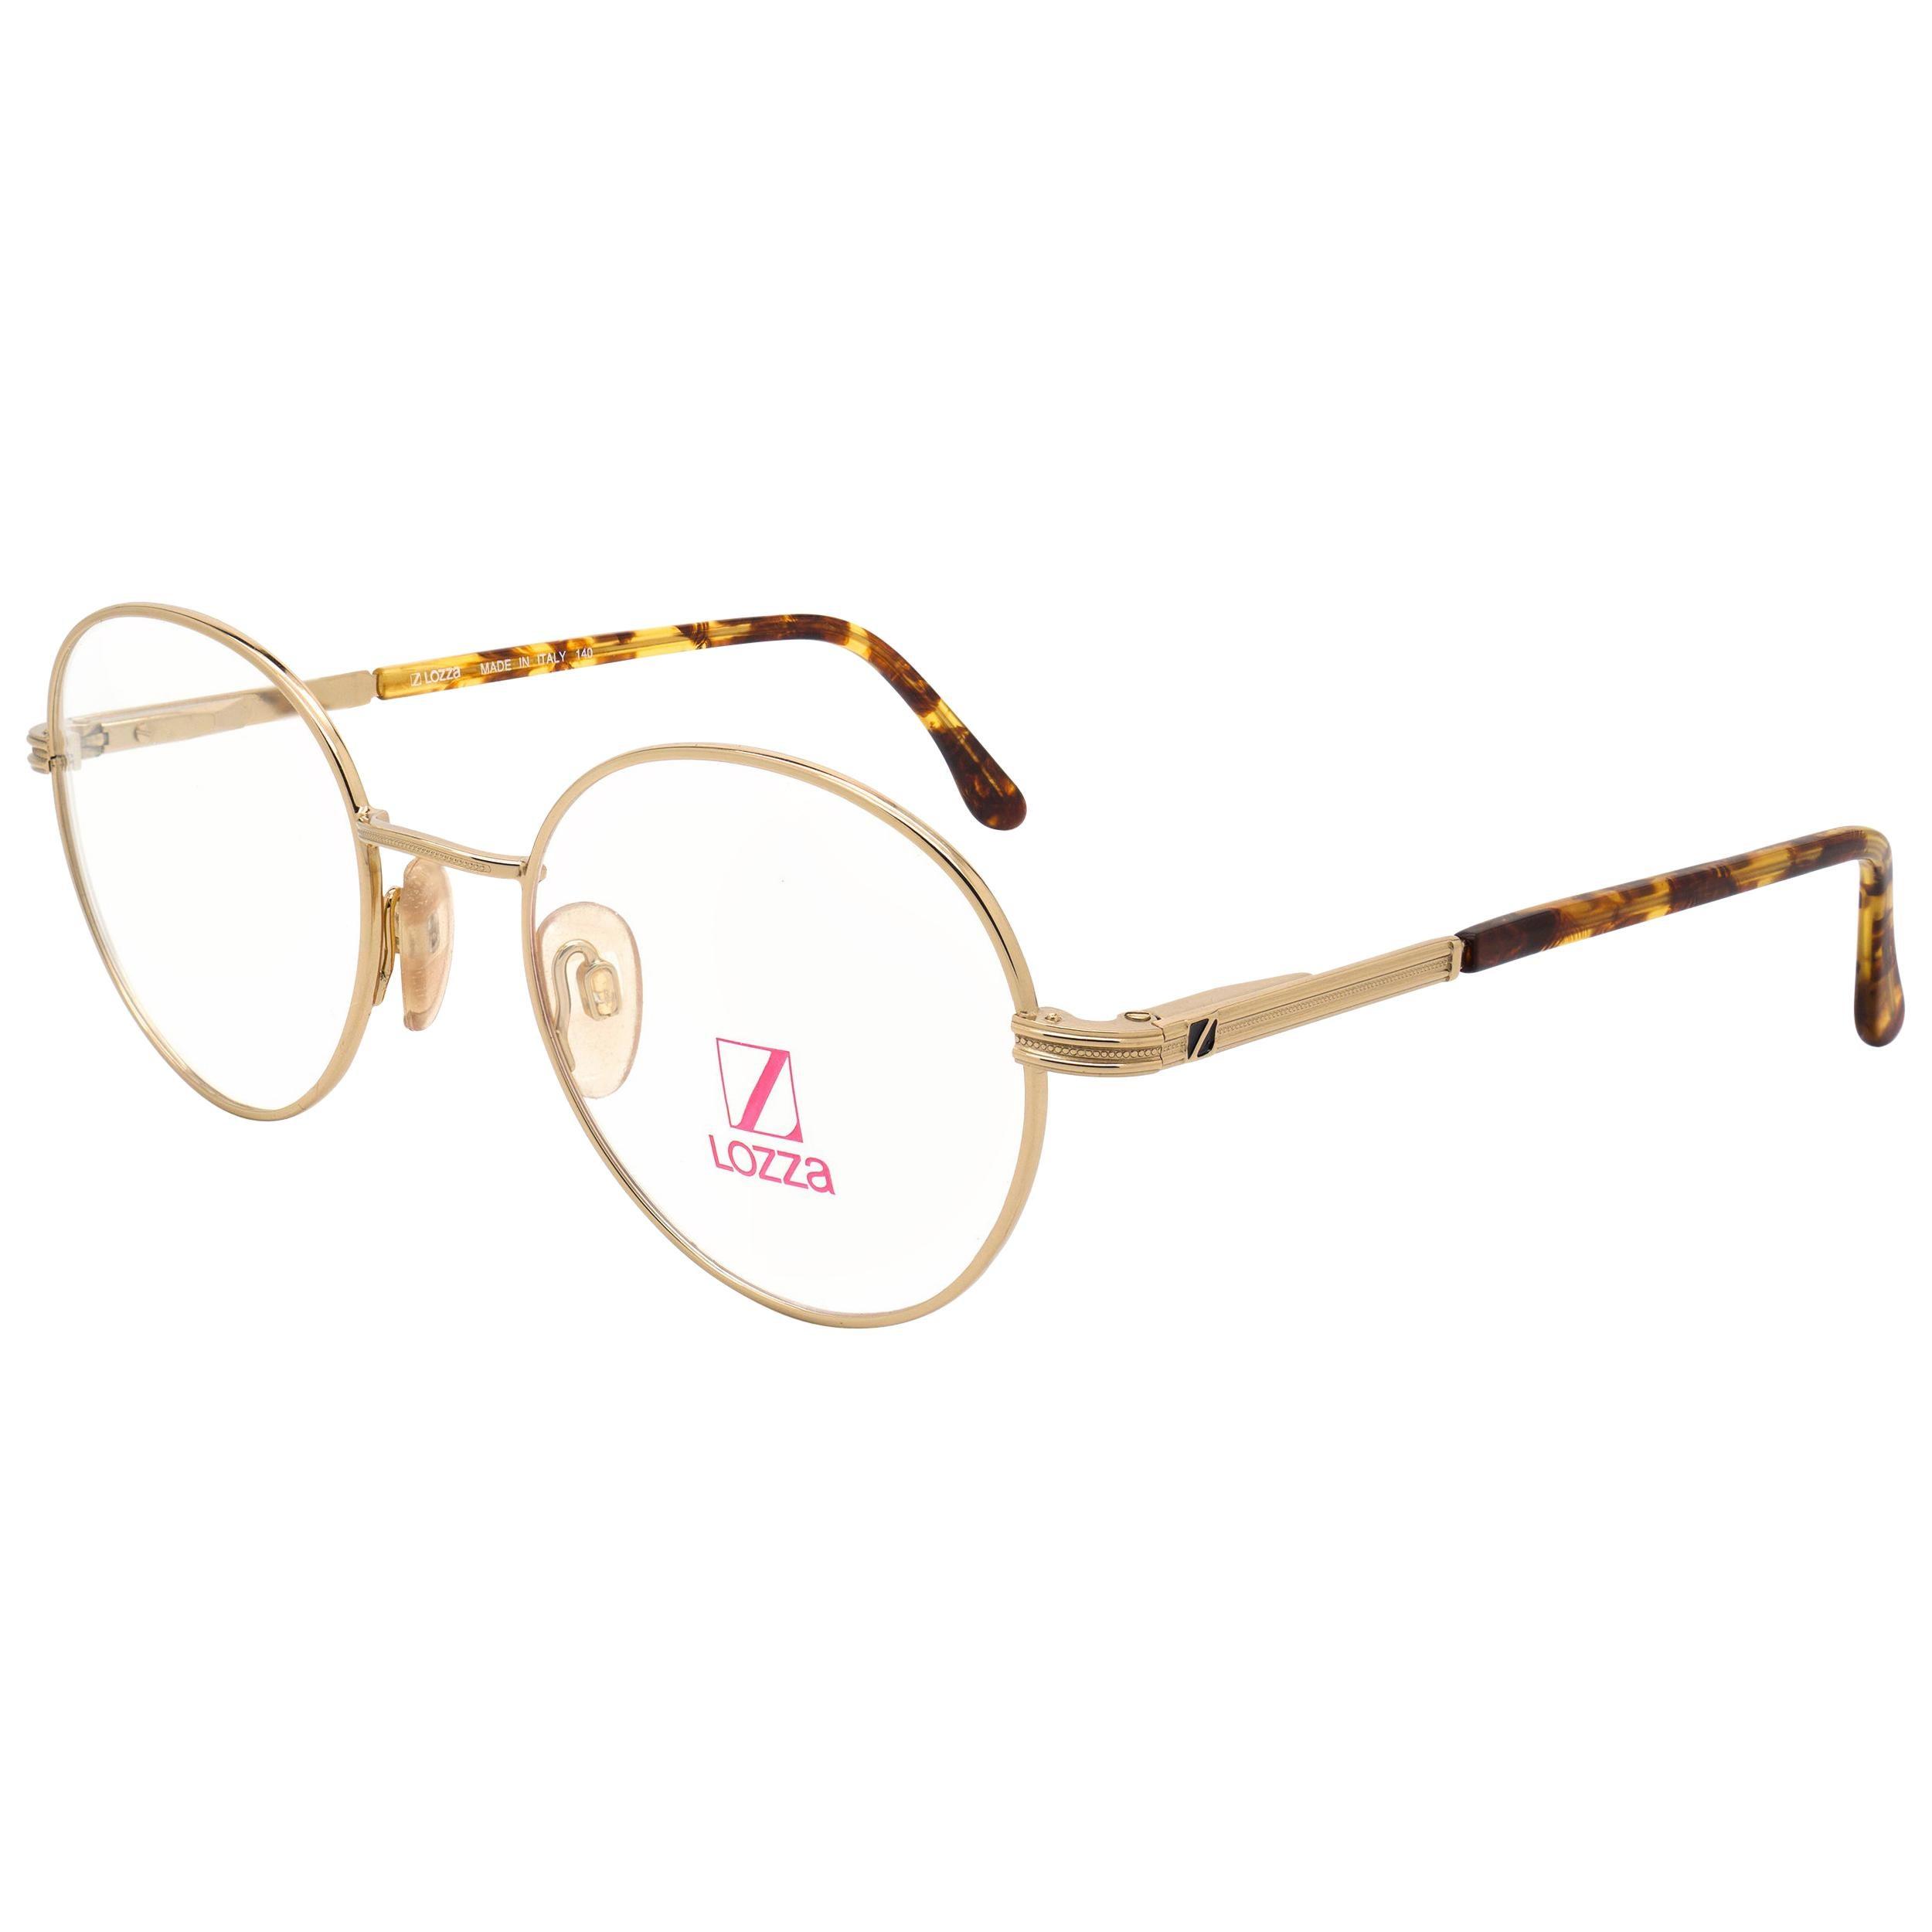 Lozza round vintage glasses frame